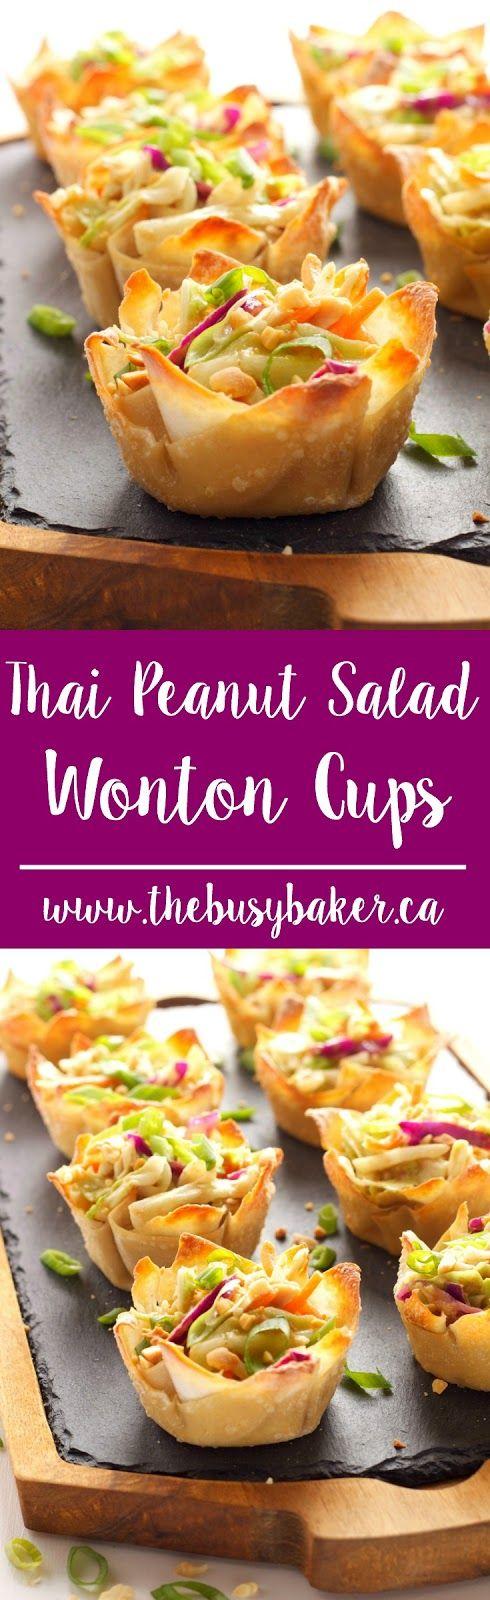 Thai Peanut Salad Wonton Cups www.thebusybaker.ca